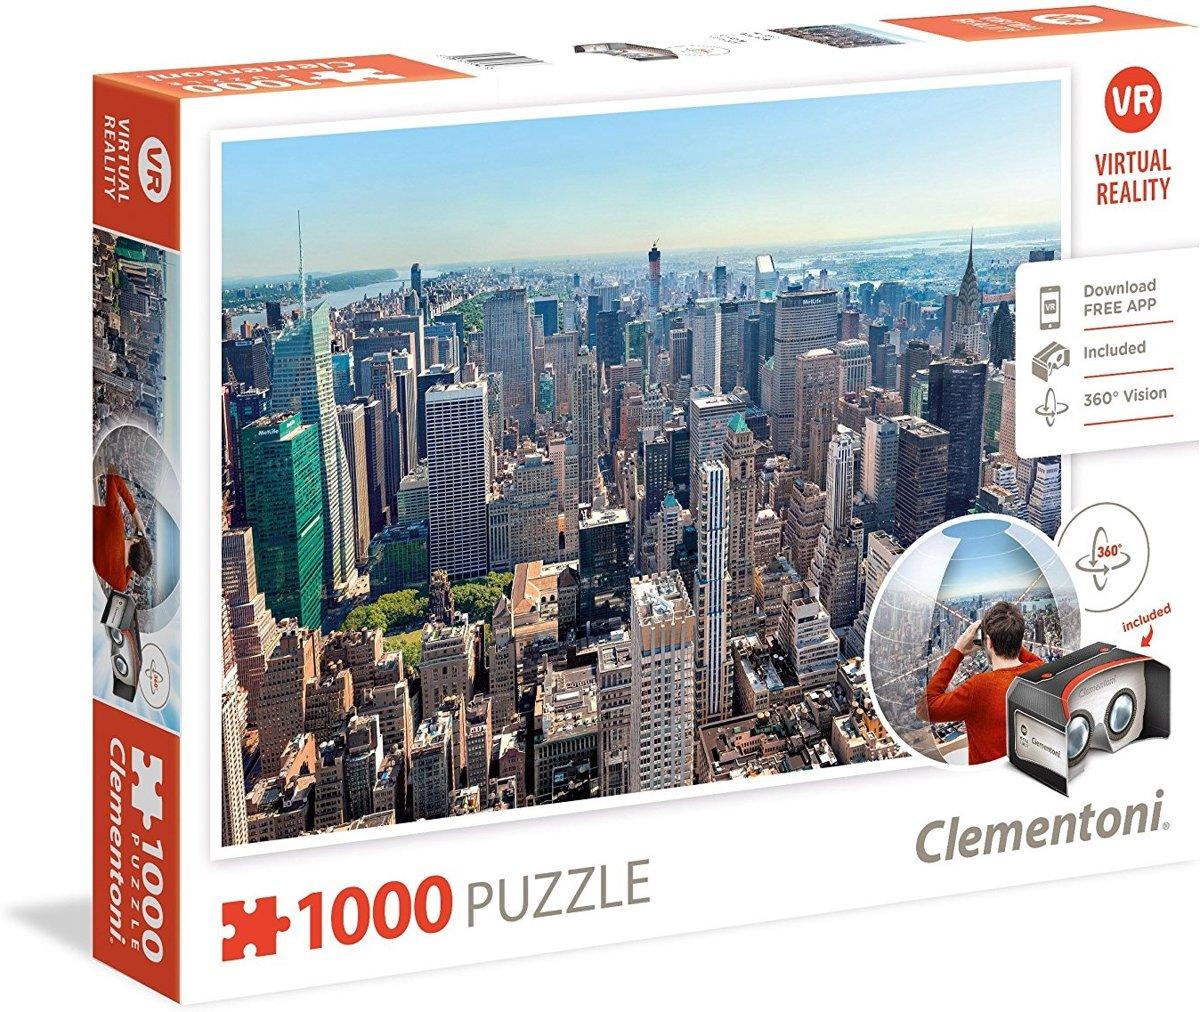 Clementoni - Puzzel - New York - Virtual reality - 1000st. kopen